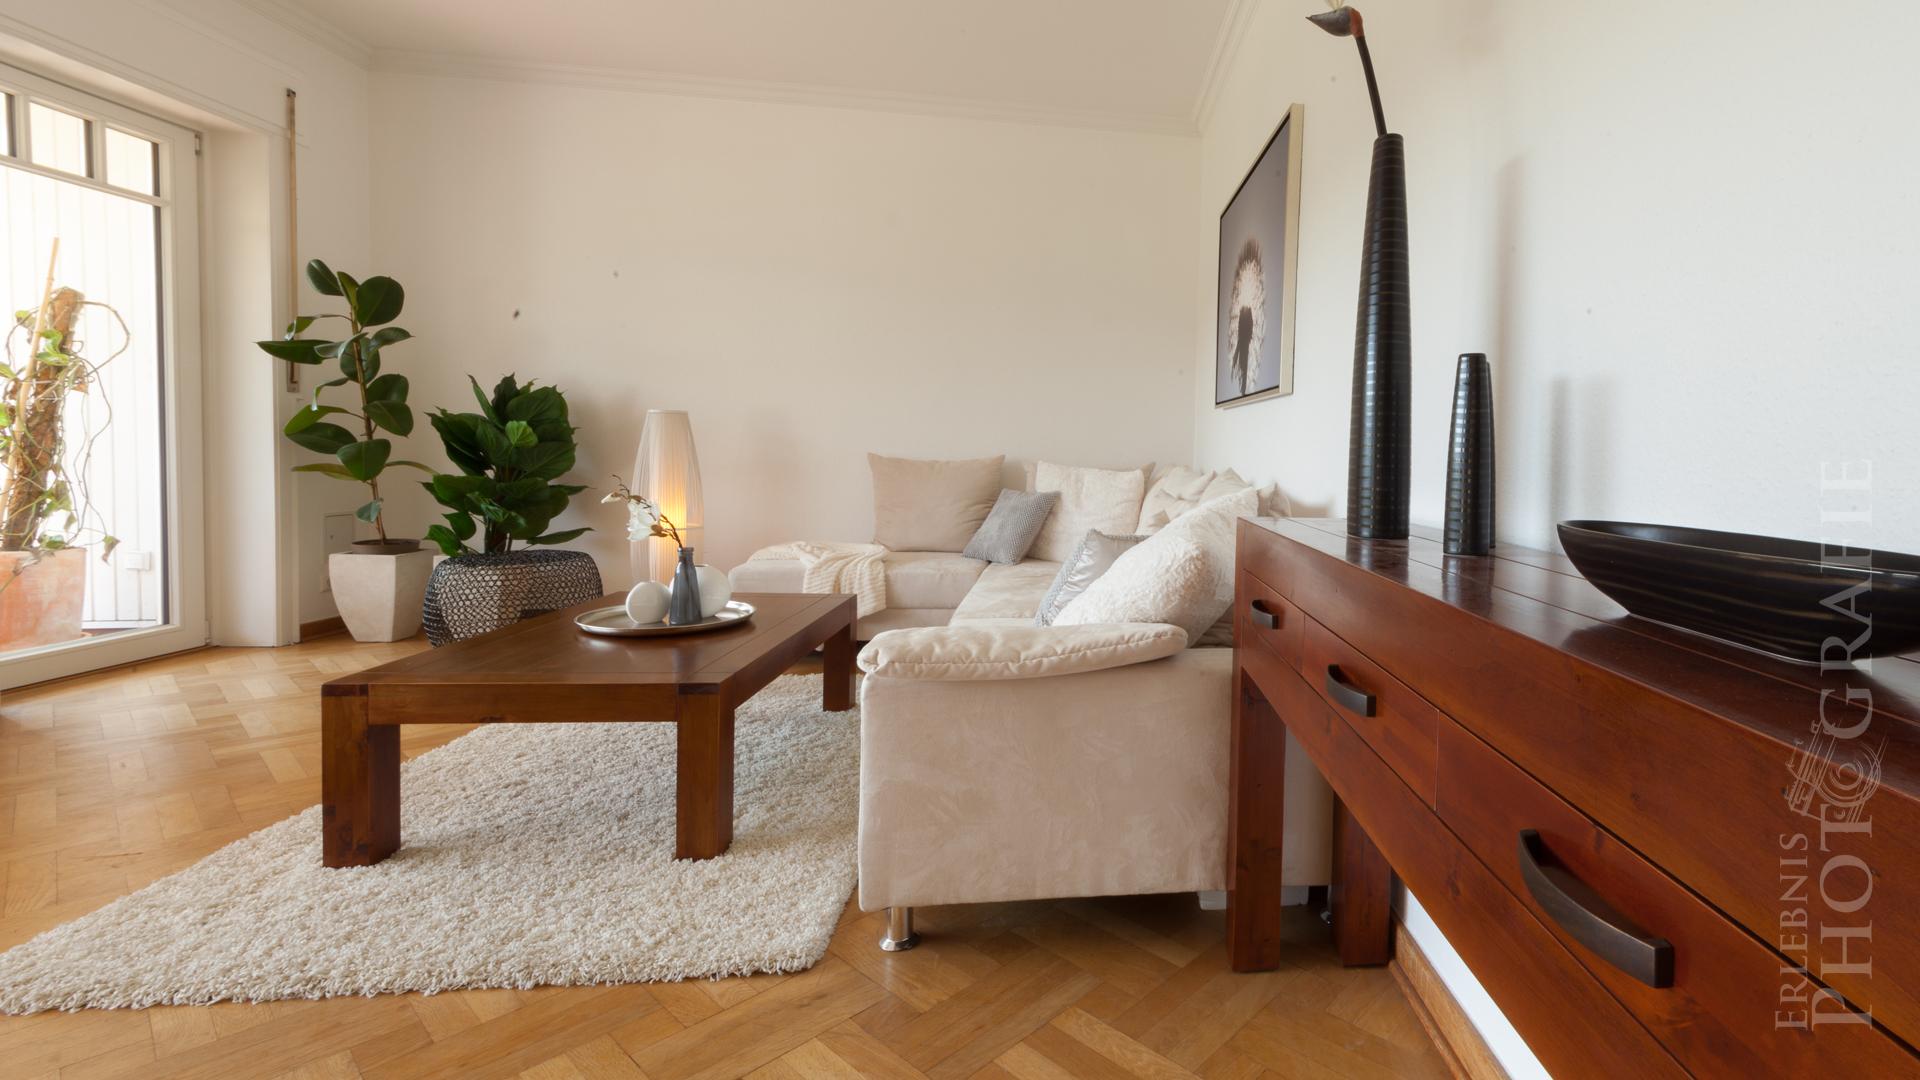 Fotostudio, Fotograf, Bremen, Immobilienfotografie